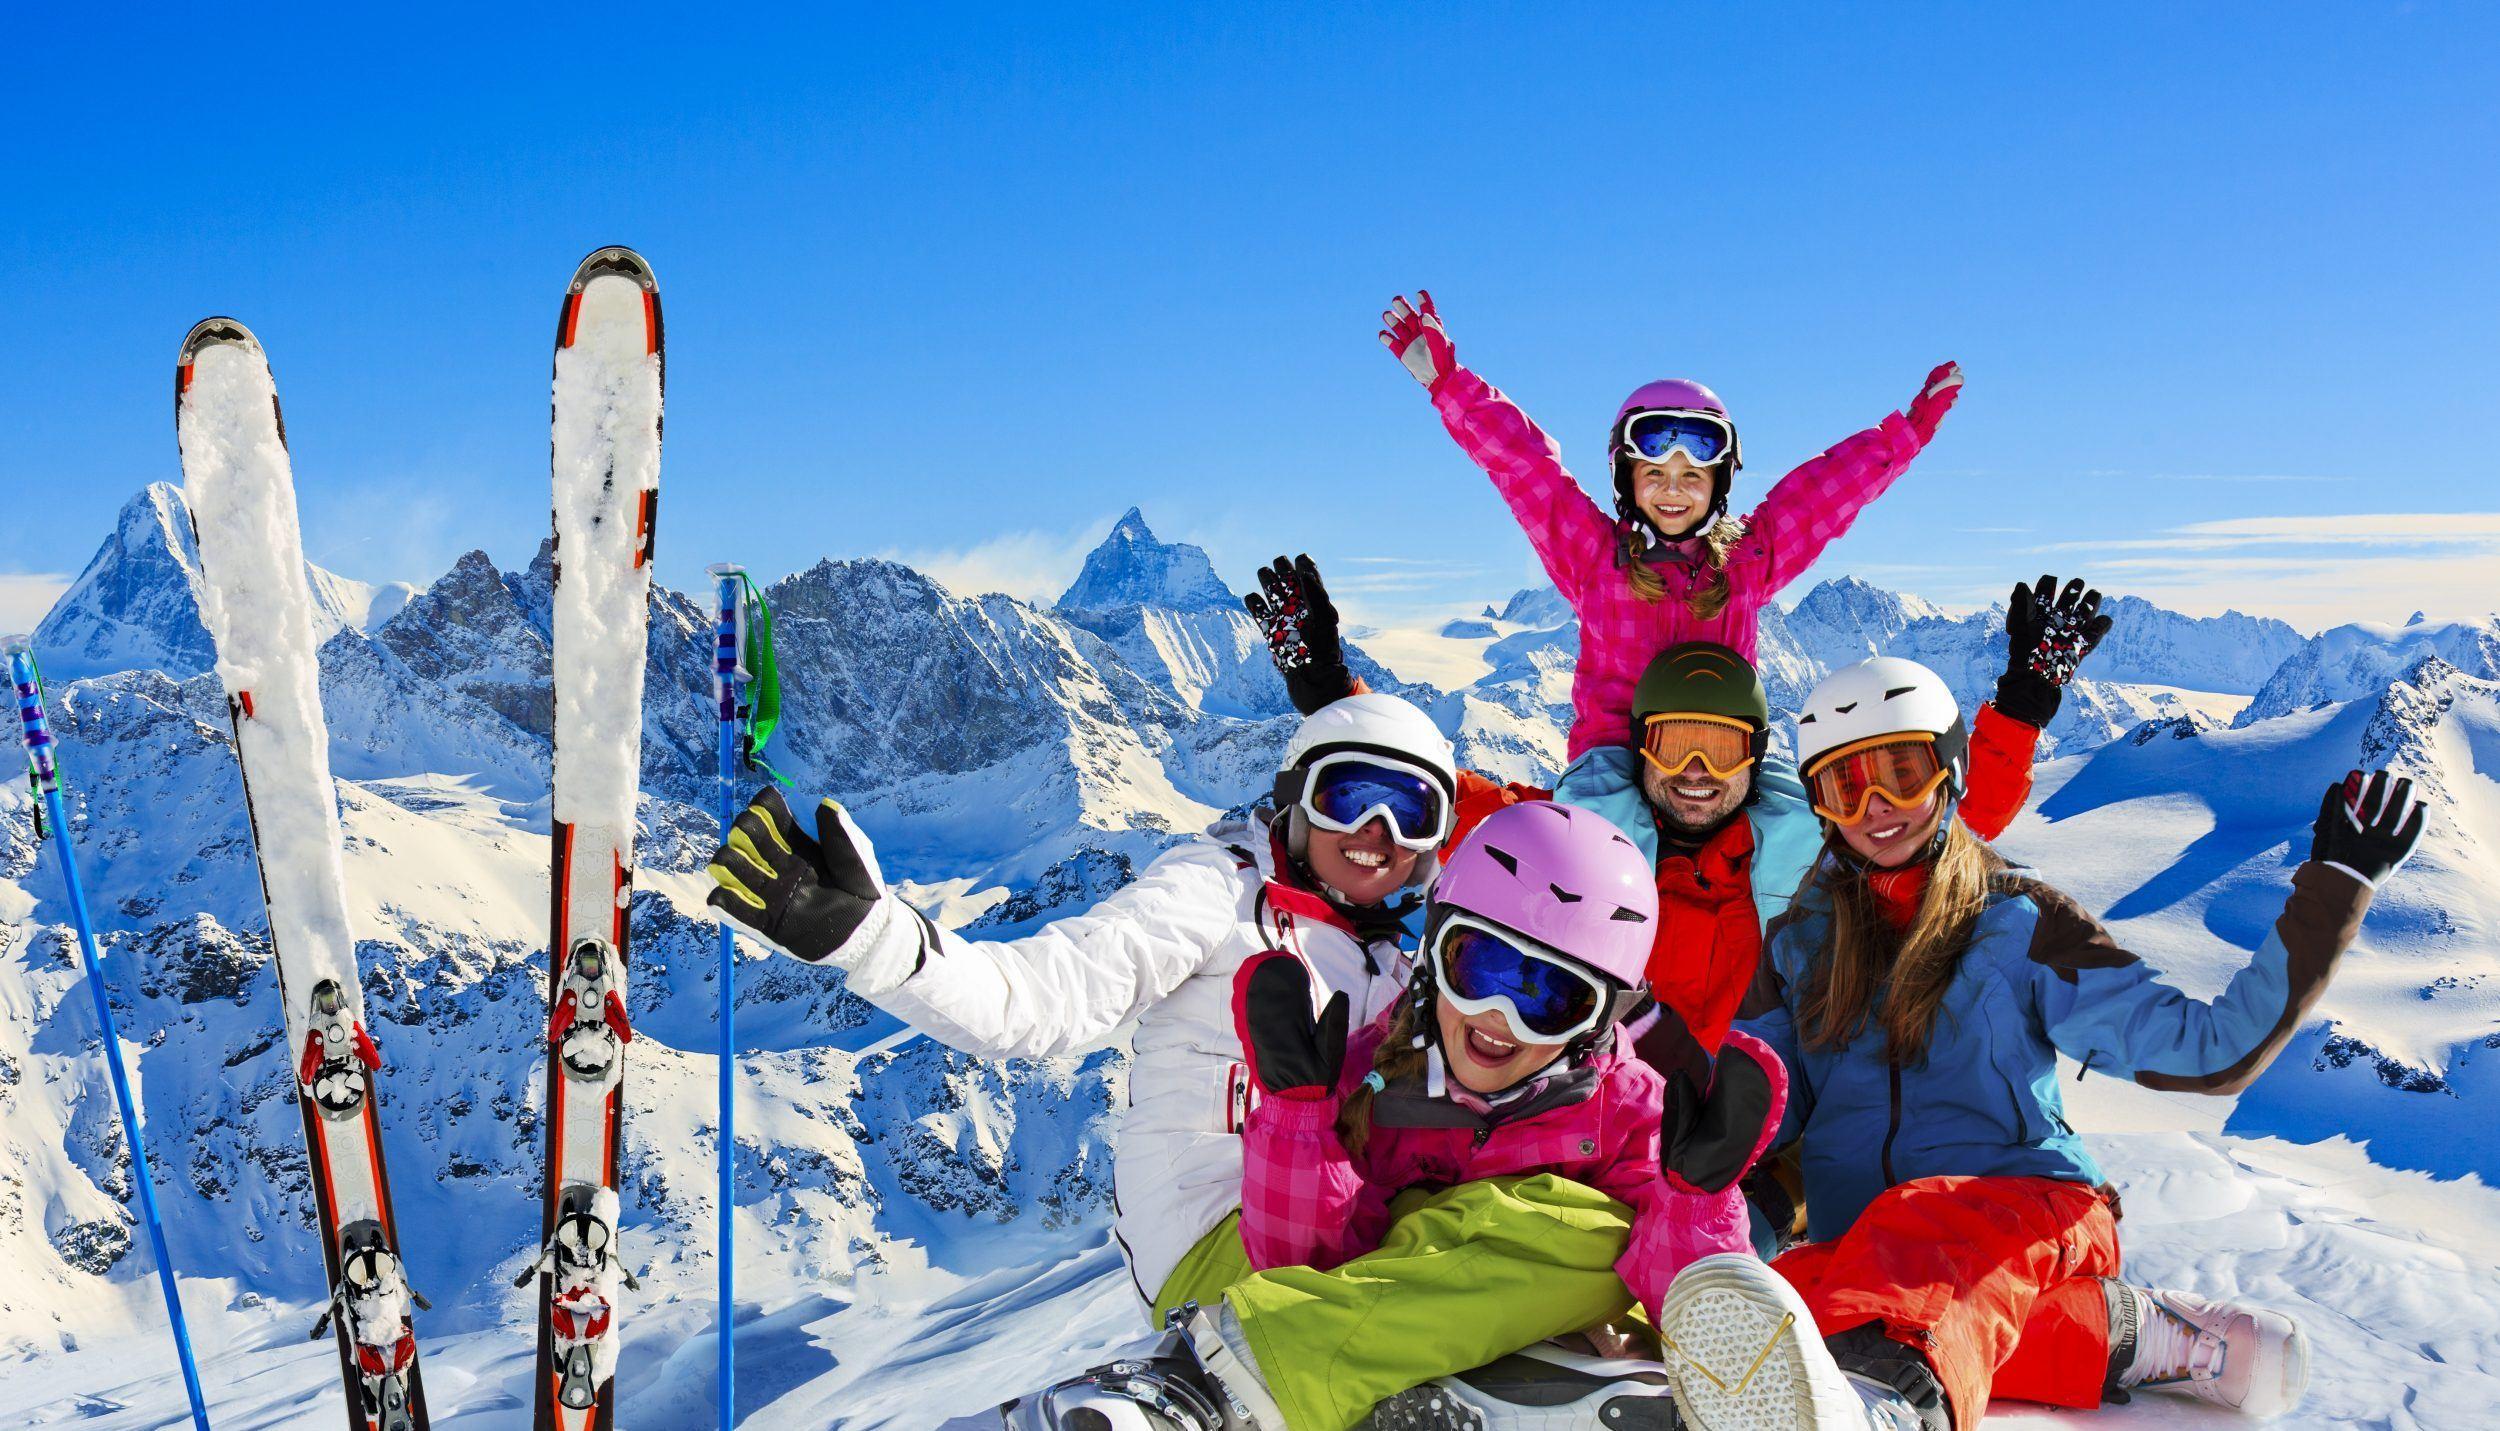 Garmisch-Partenkirchen ski resort | Skiing in Garmisch ... on bansko ski map, madonna di campiglio ski map, tamarack resort ski map, courchevel ski map, germany ski map, garmisch-partenkirchen ski poster, st. moritz ski map, deer valley ski map, cortina d'ampezzo ski map, buck hill ski map, chamonix ski map, klosters ski map, kitzbuhel ski map, grenoble ski map, schladming ski map, zermatt ski map, europe ski map, garmisch-partenkirchen ski jump,